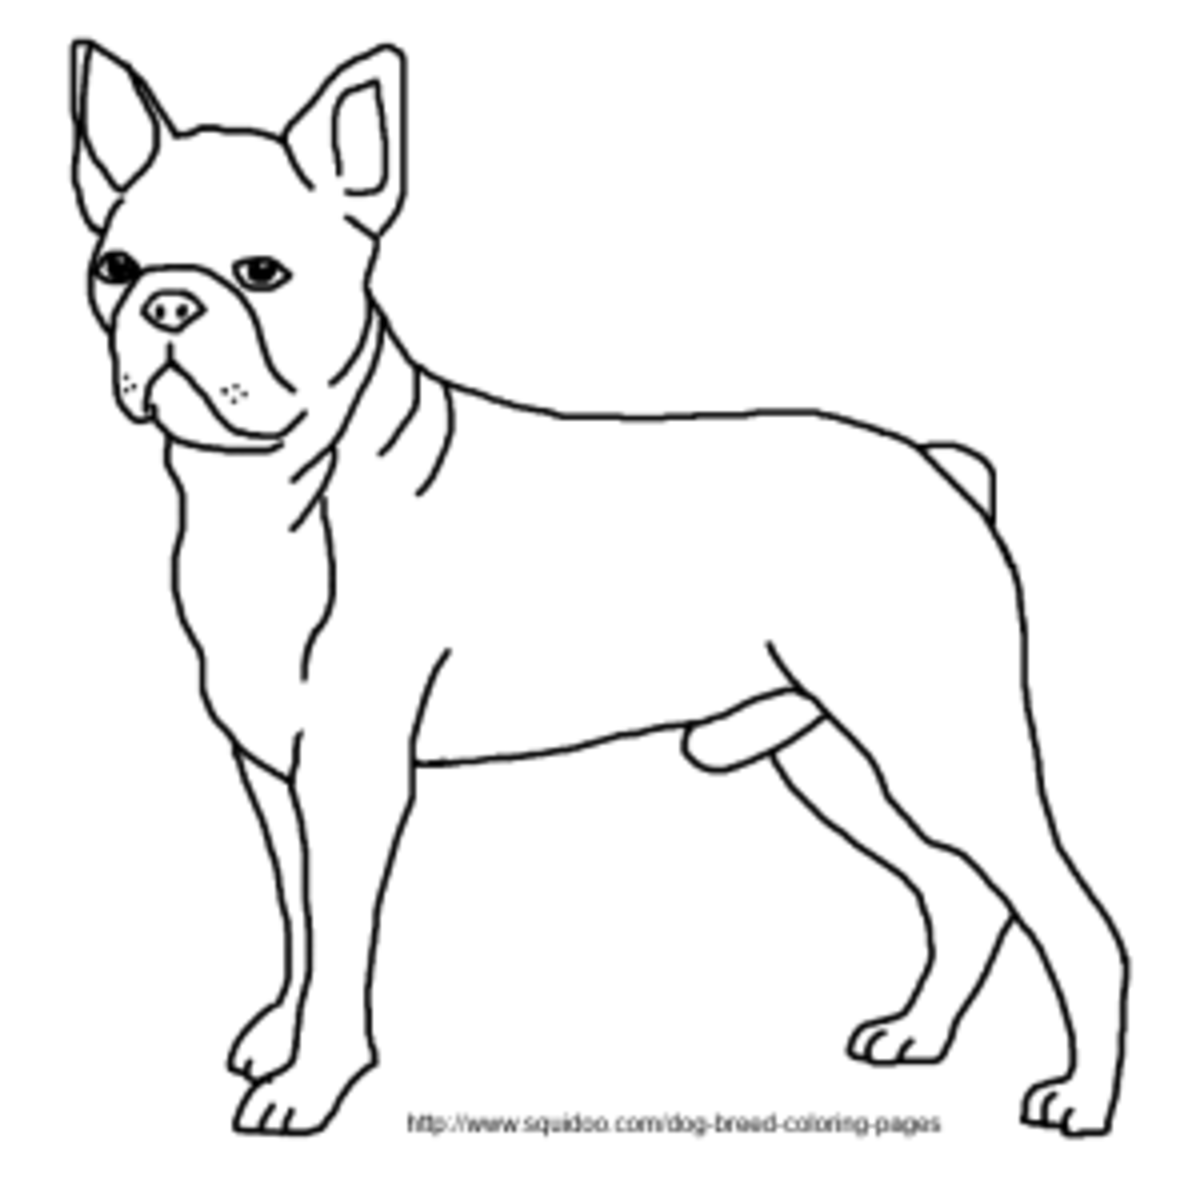 boston terrier coloring page image boston terrier coloring page dog breeds picture Barbie Coloring Pages Printable  Boston Terrier Coloring Pages Printable